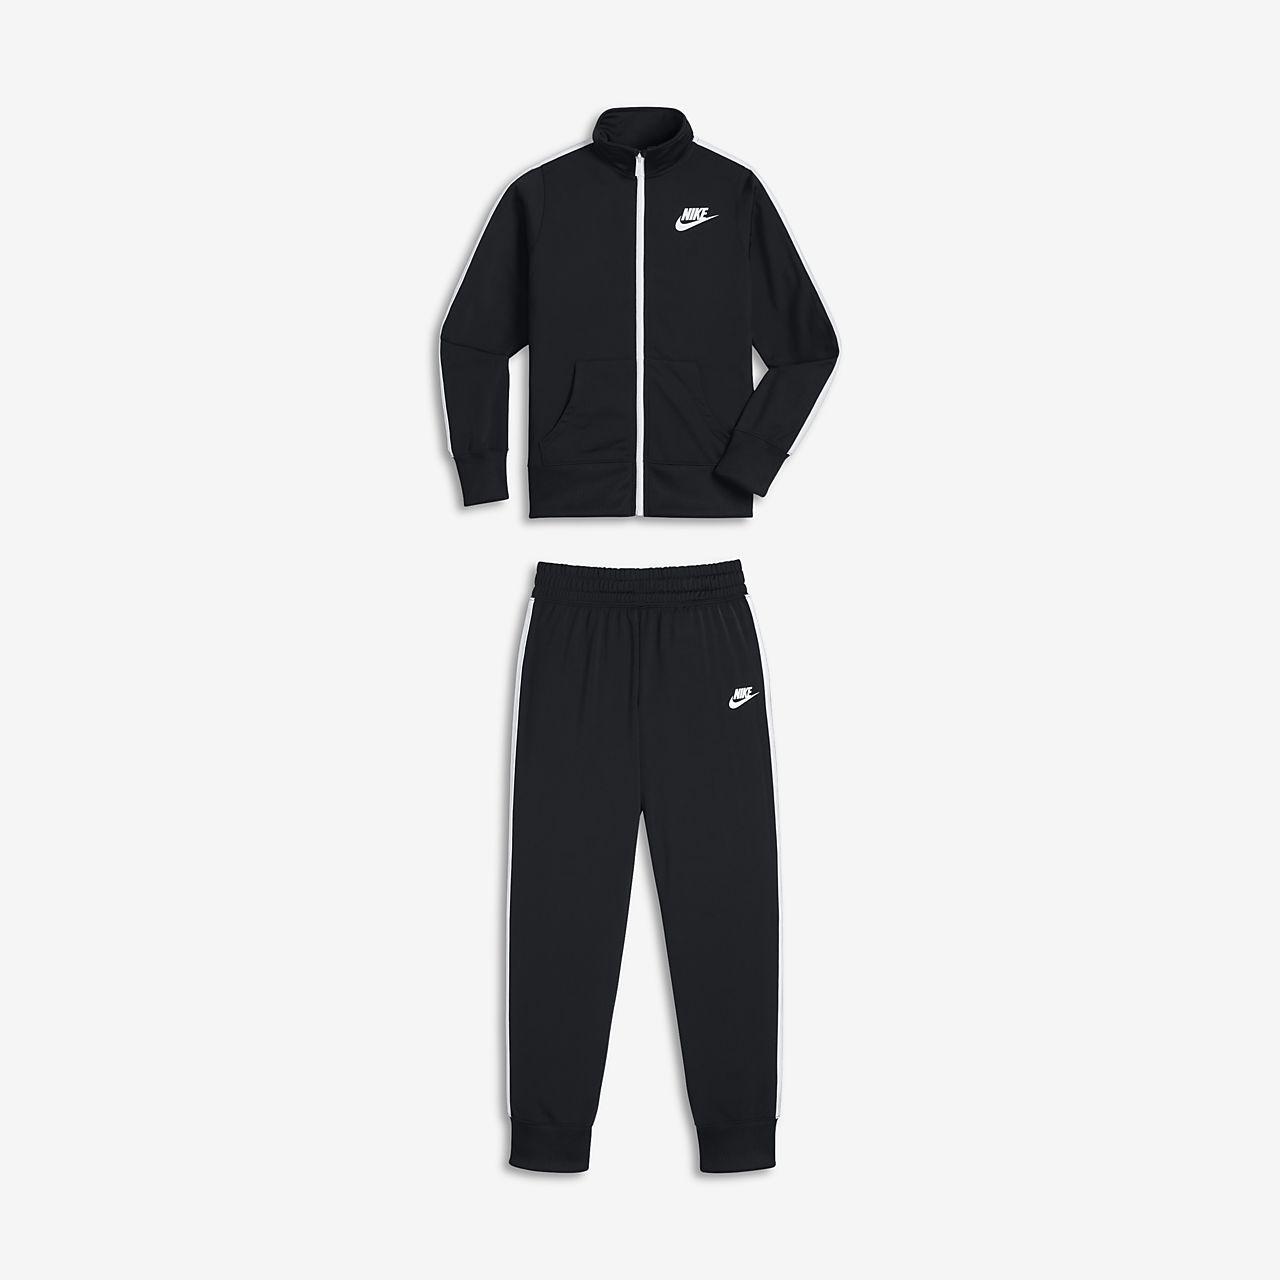 a7a6c4b7ff0 Nike Sportswear Warm-Up Big Kids' (Girls') Track Suit | Kid's style ...